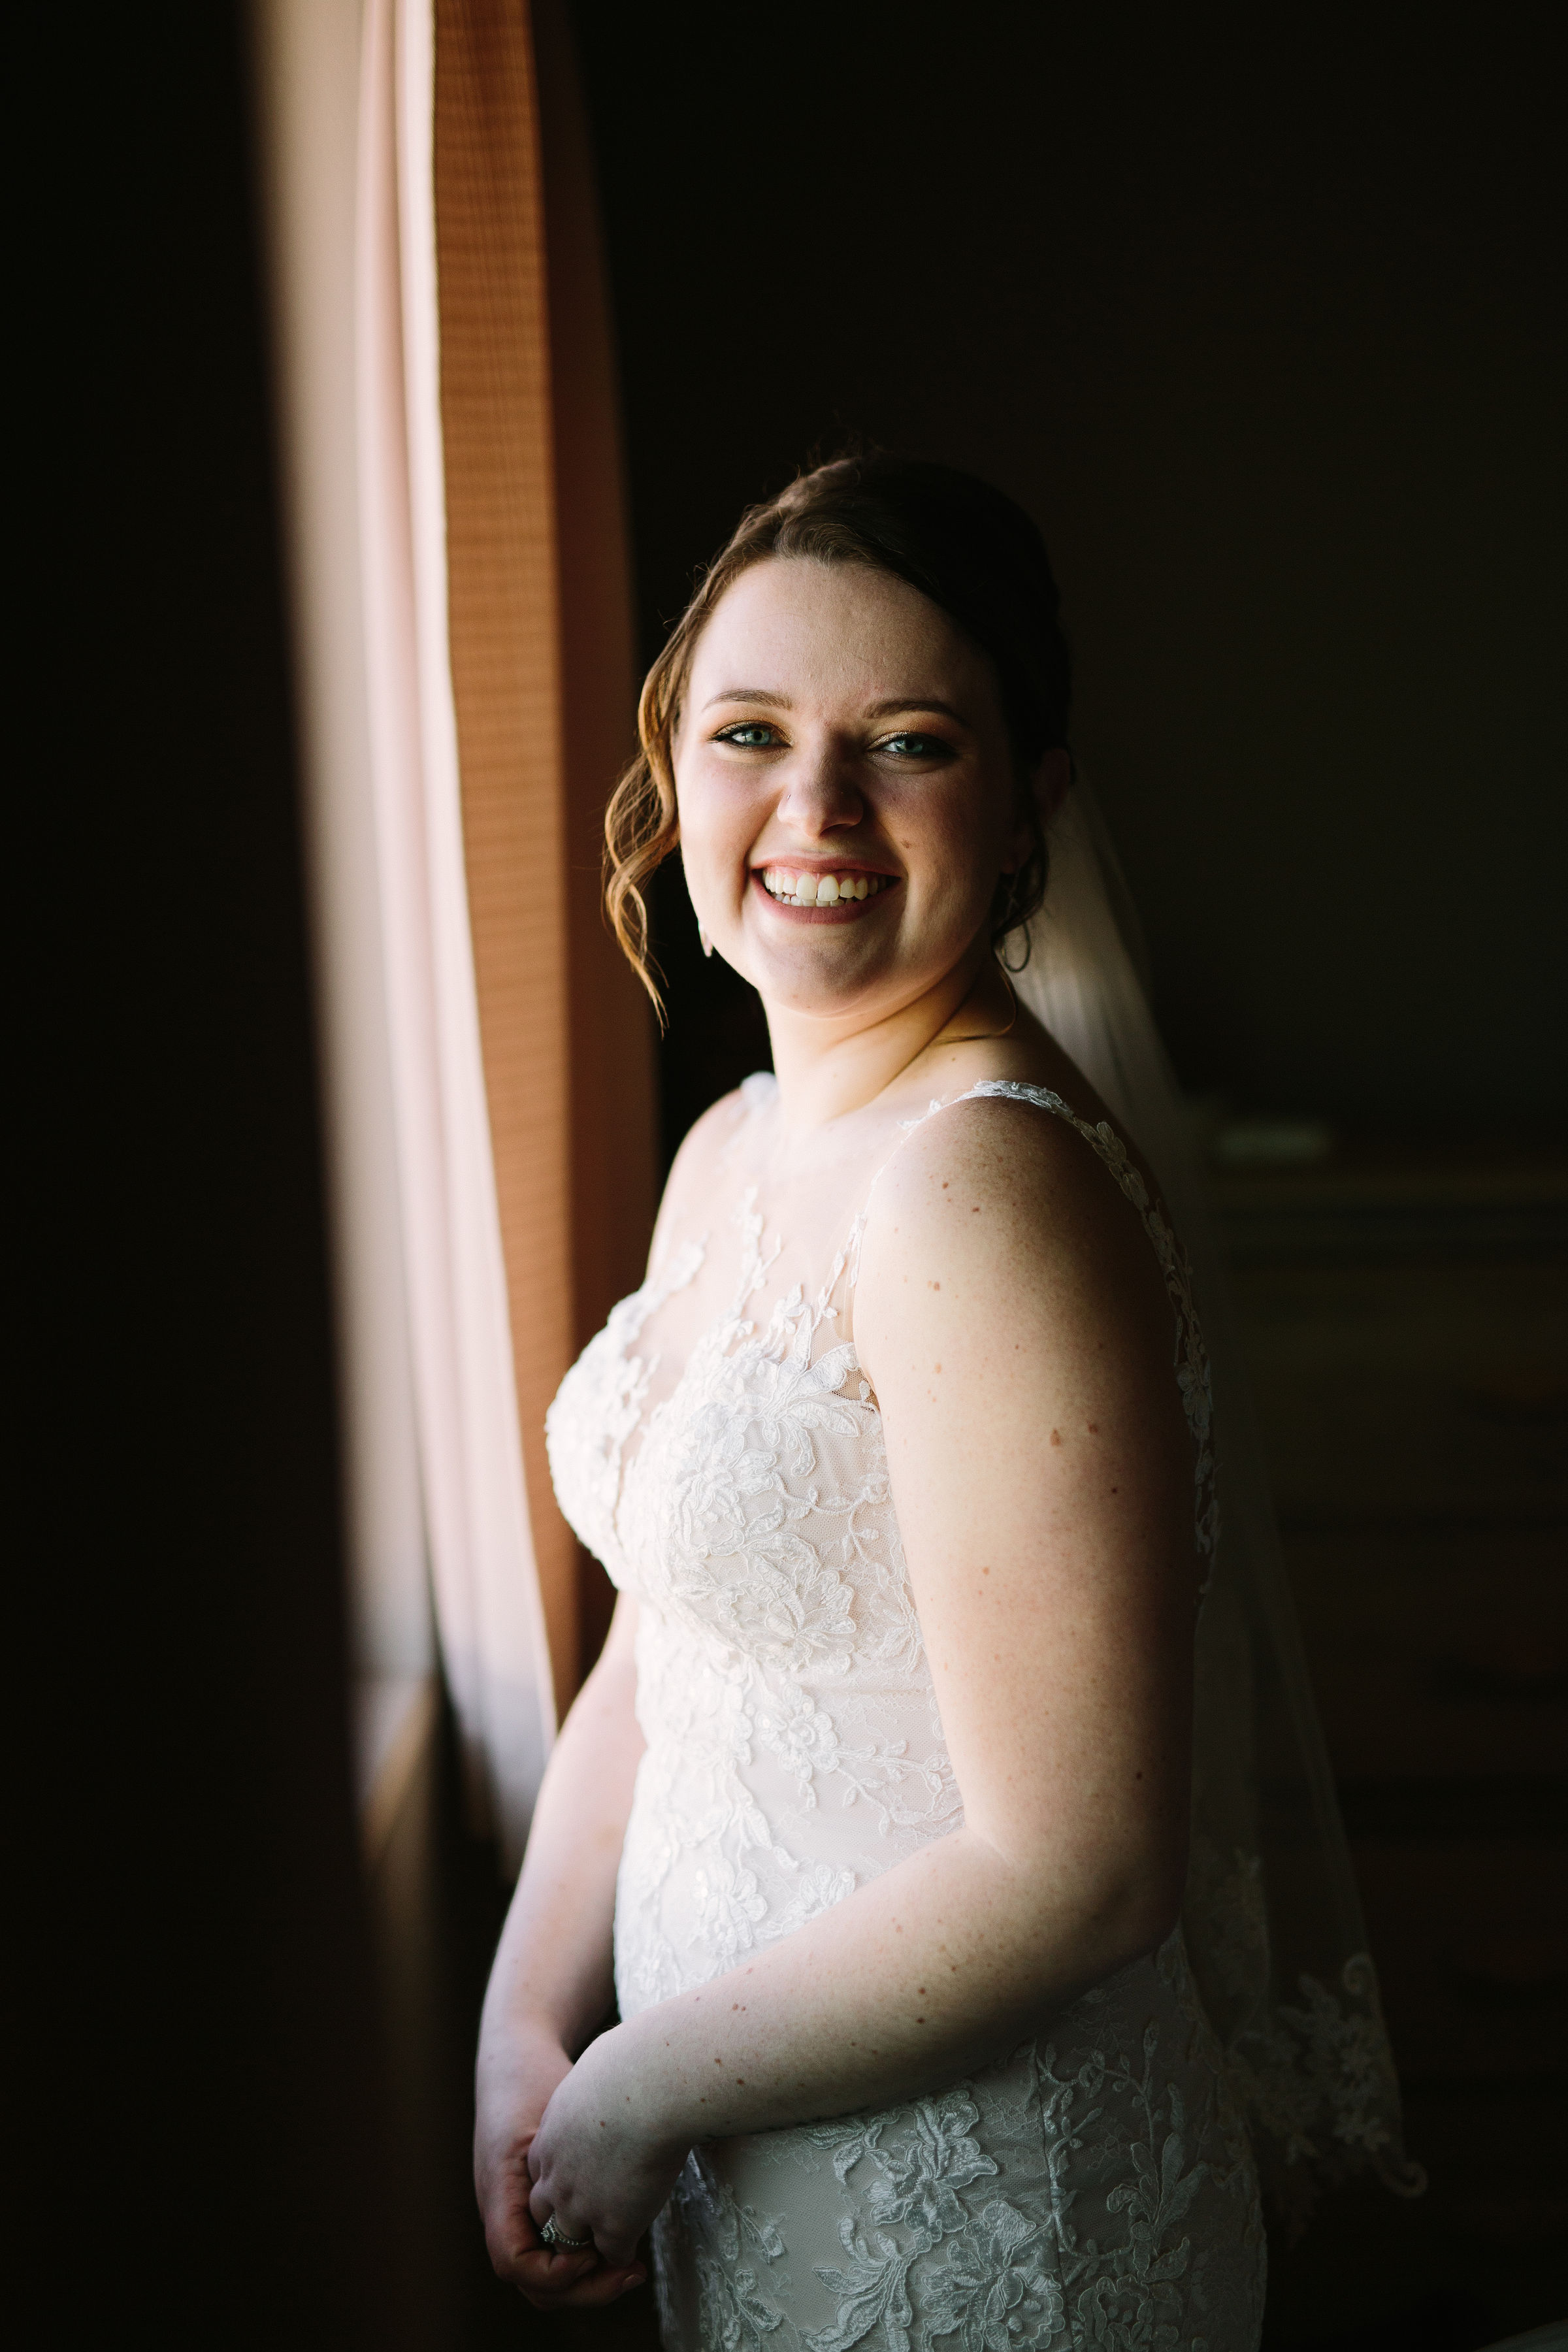 Fun Rustic spokane wedding bride smiling veil wedding dress ready